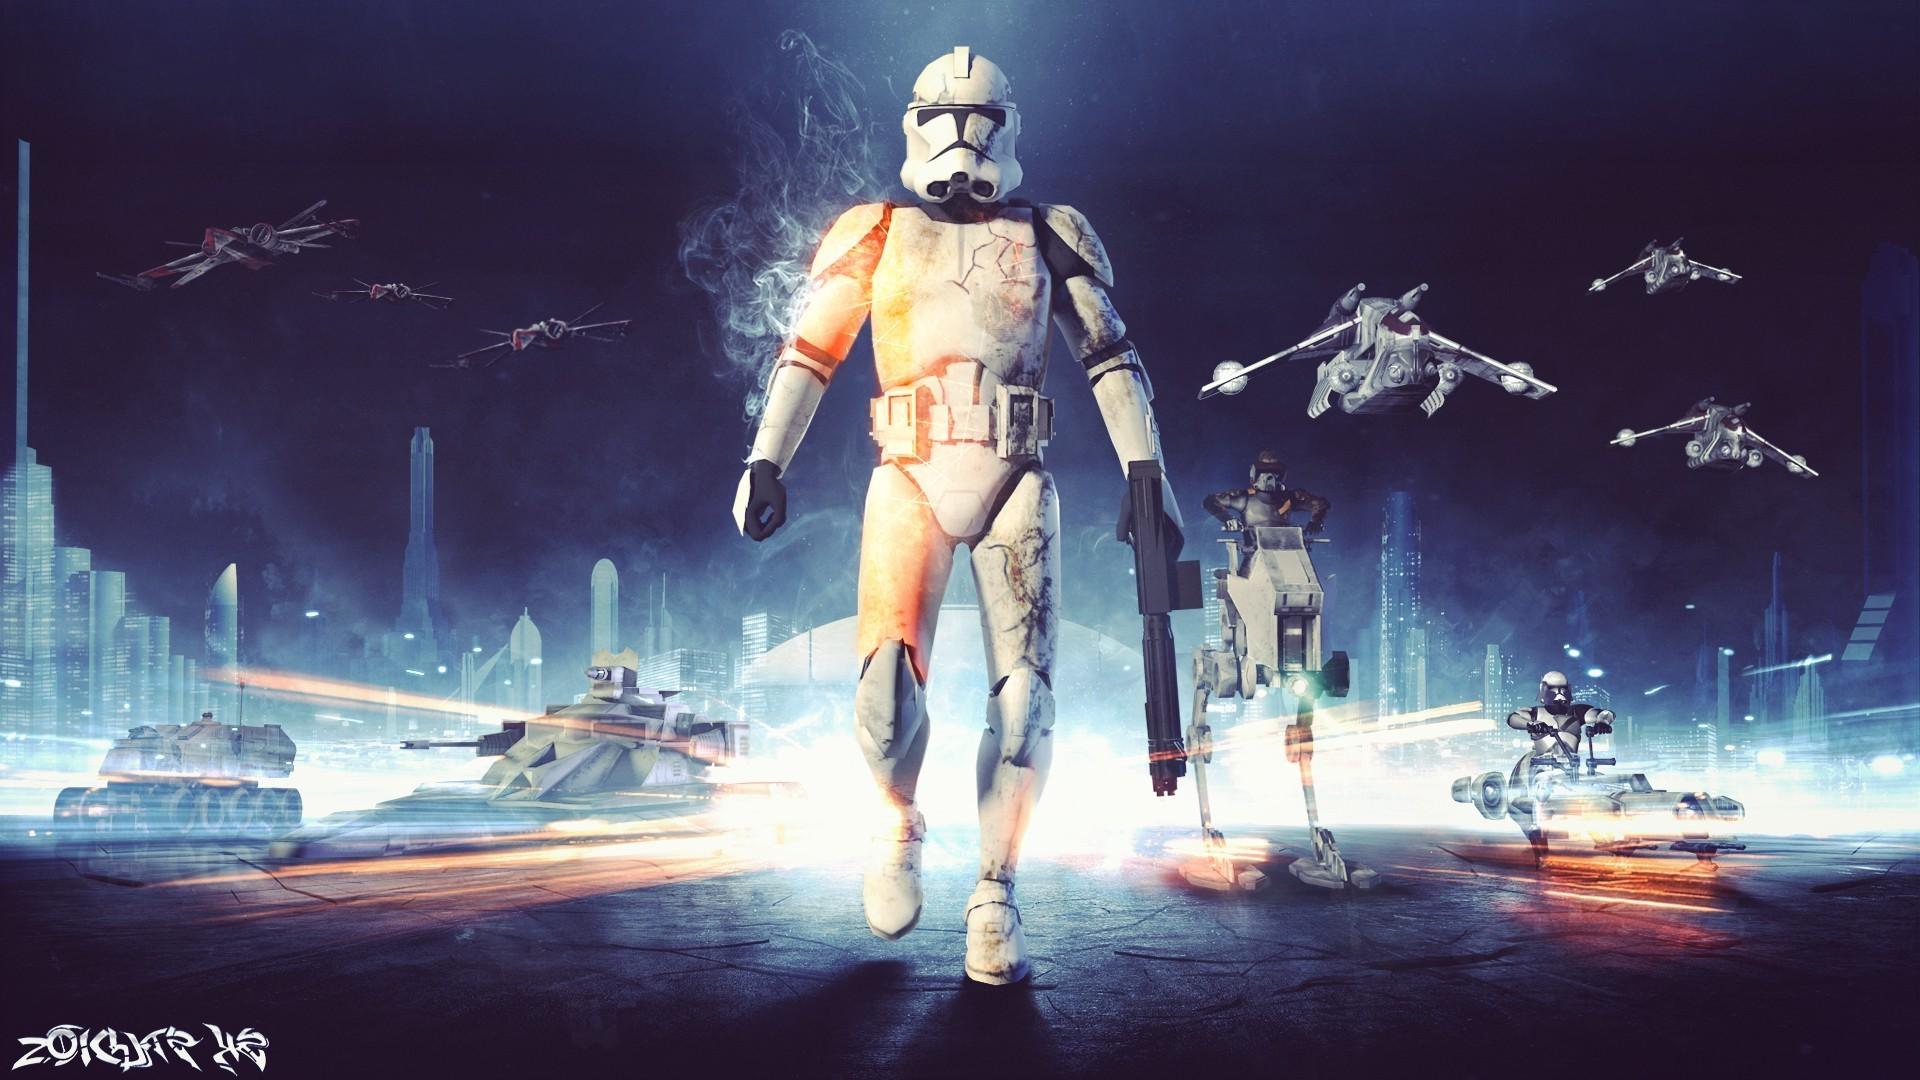 Res: 1920x1080, Star Wars, Stormtrooper, Battlefield 3, Video Games Wallpapers HD / Desktop  and Mobile Backgrounds